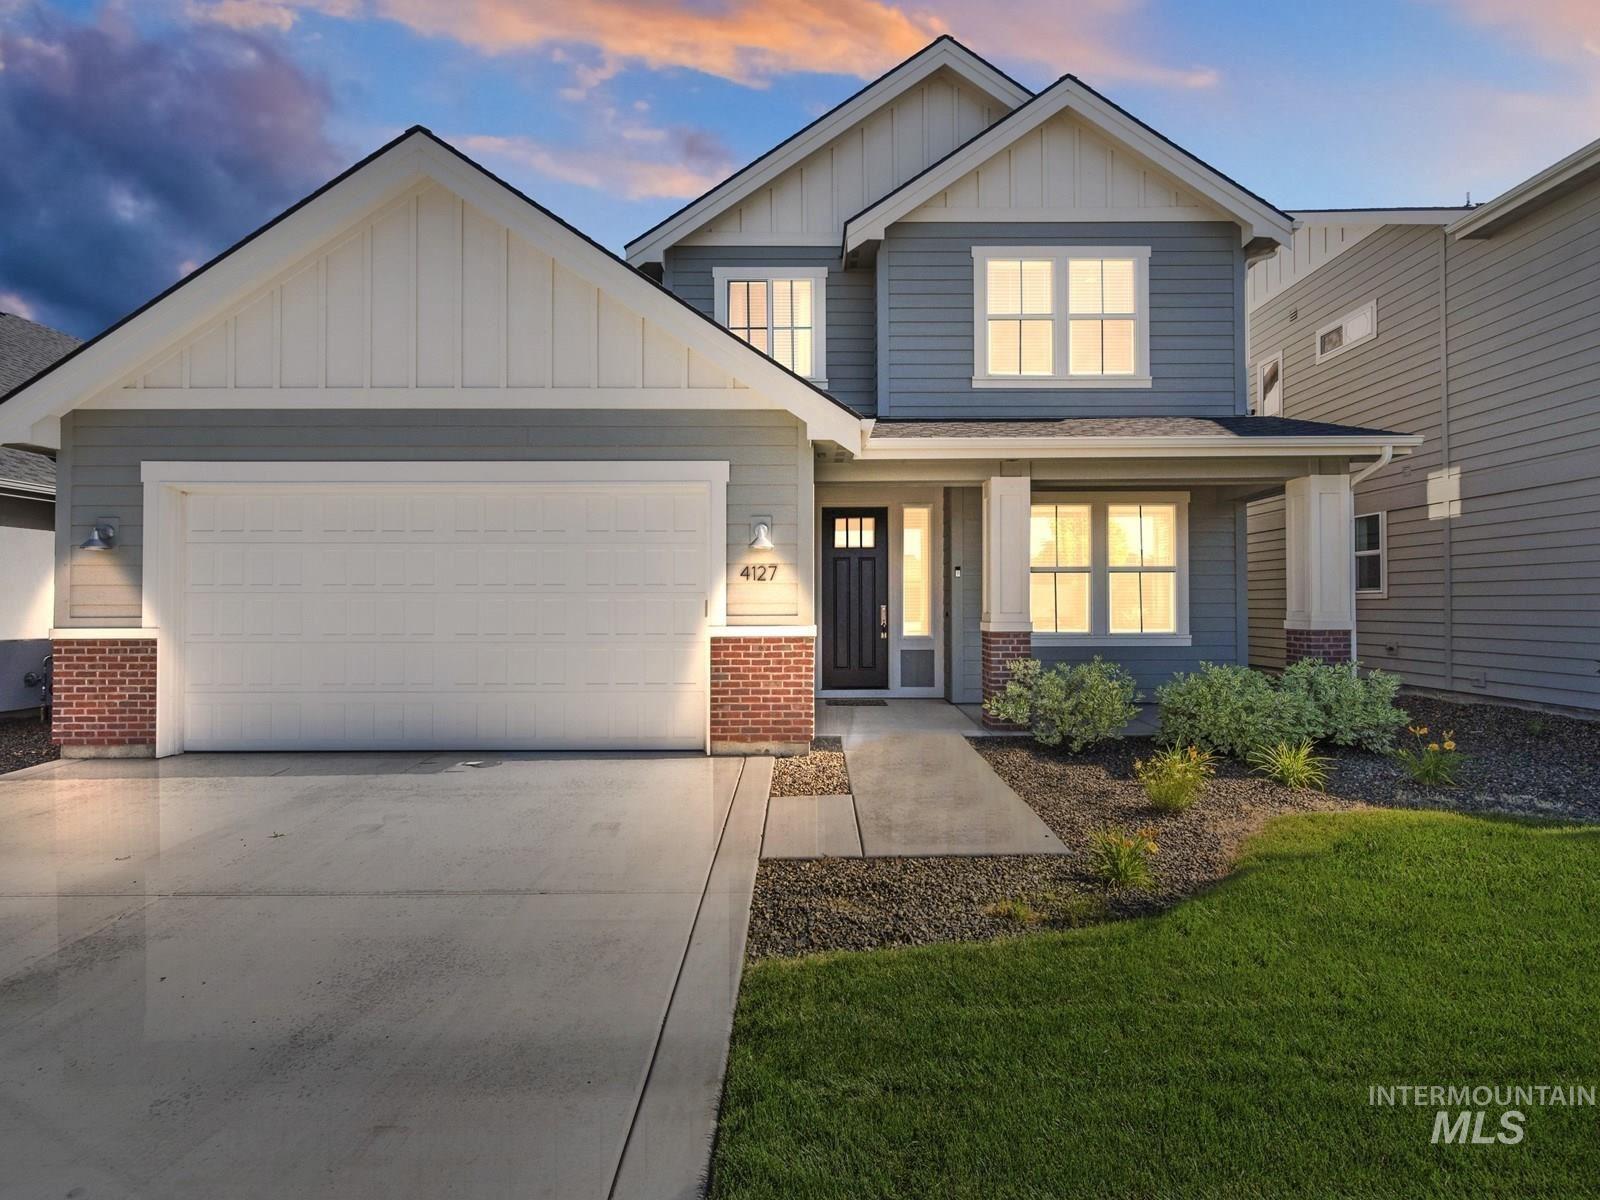 4127 W Bavaria Street, Eagle, ID 83616 - MLS#: 98771718